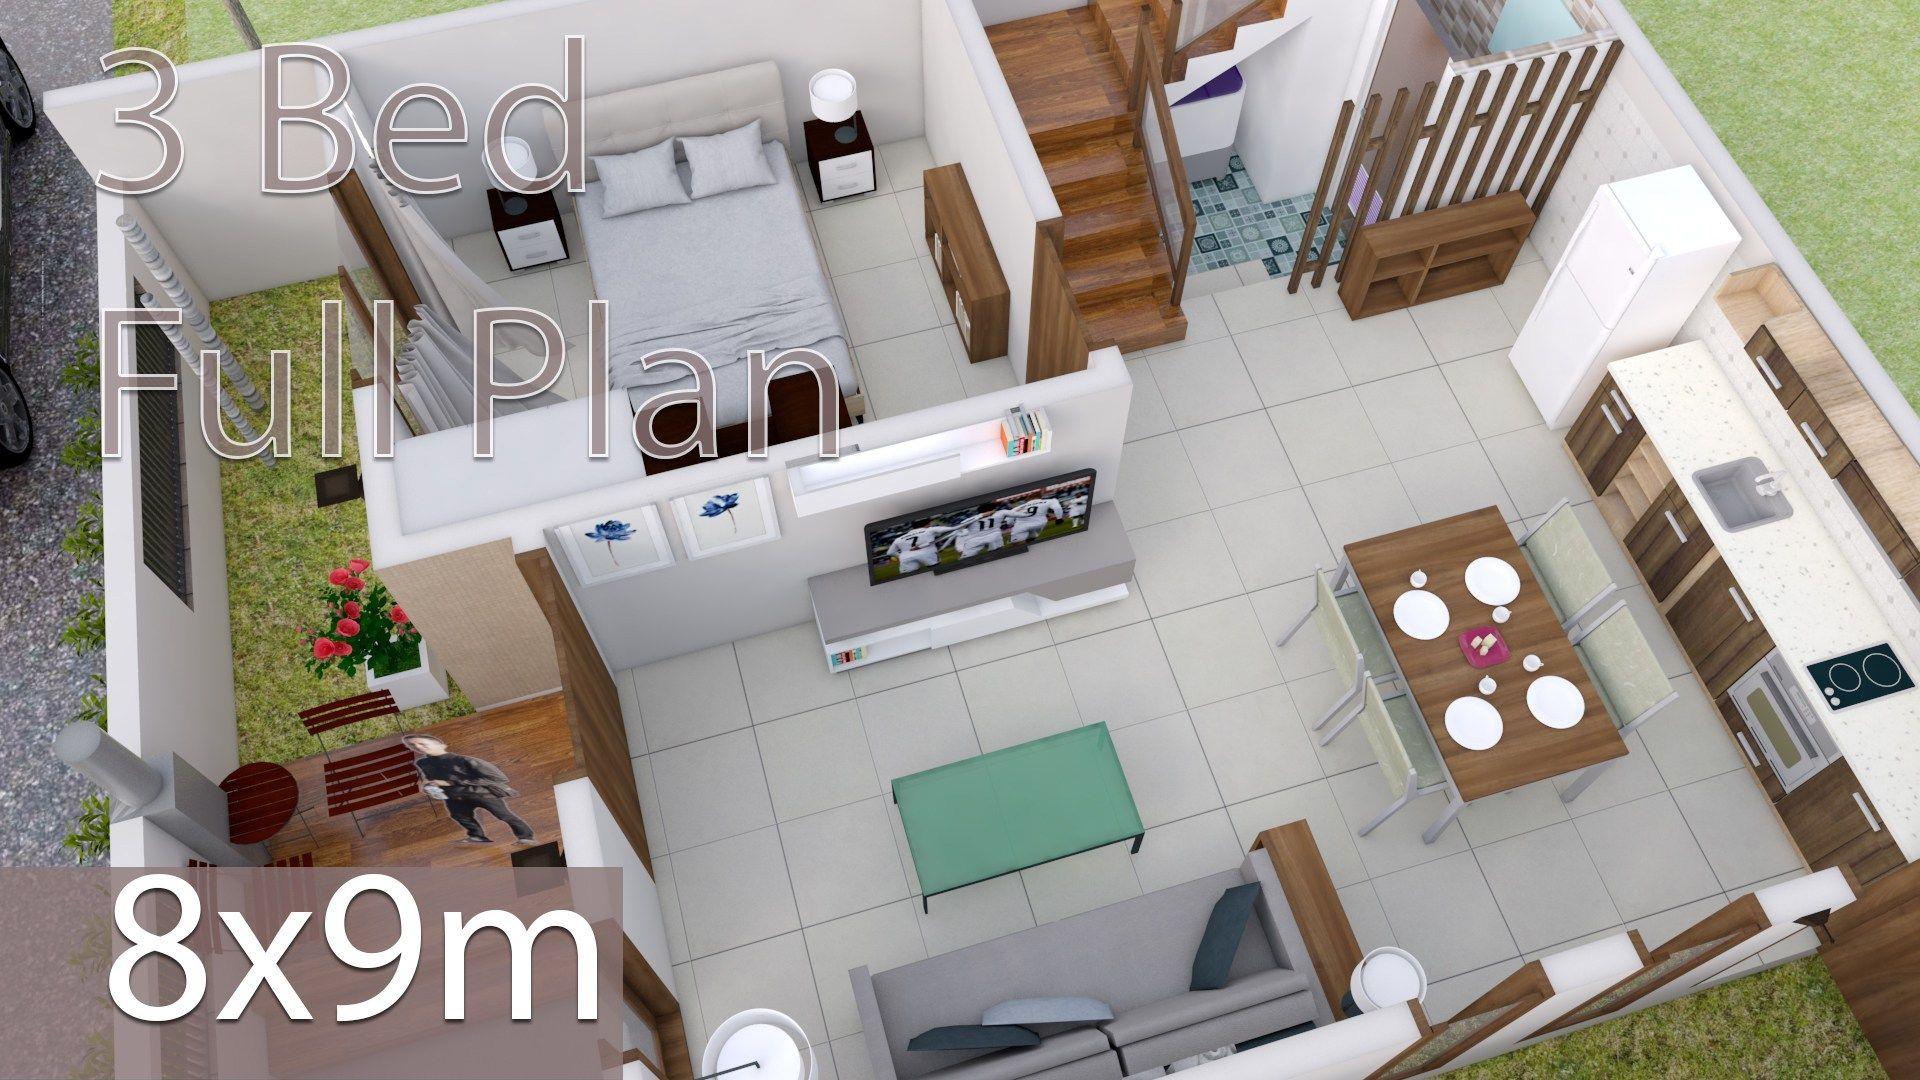 Interior Design Plan 8x9m With 3 Bedrooms Home Design Plans